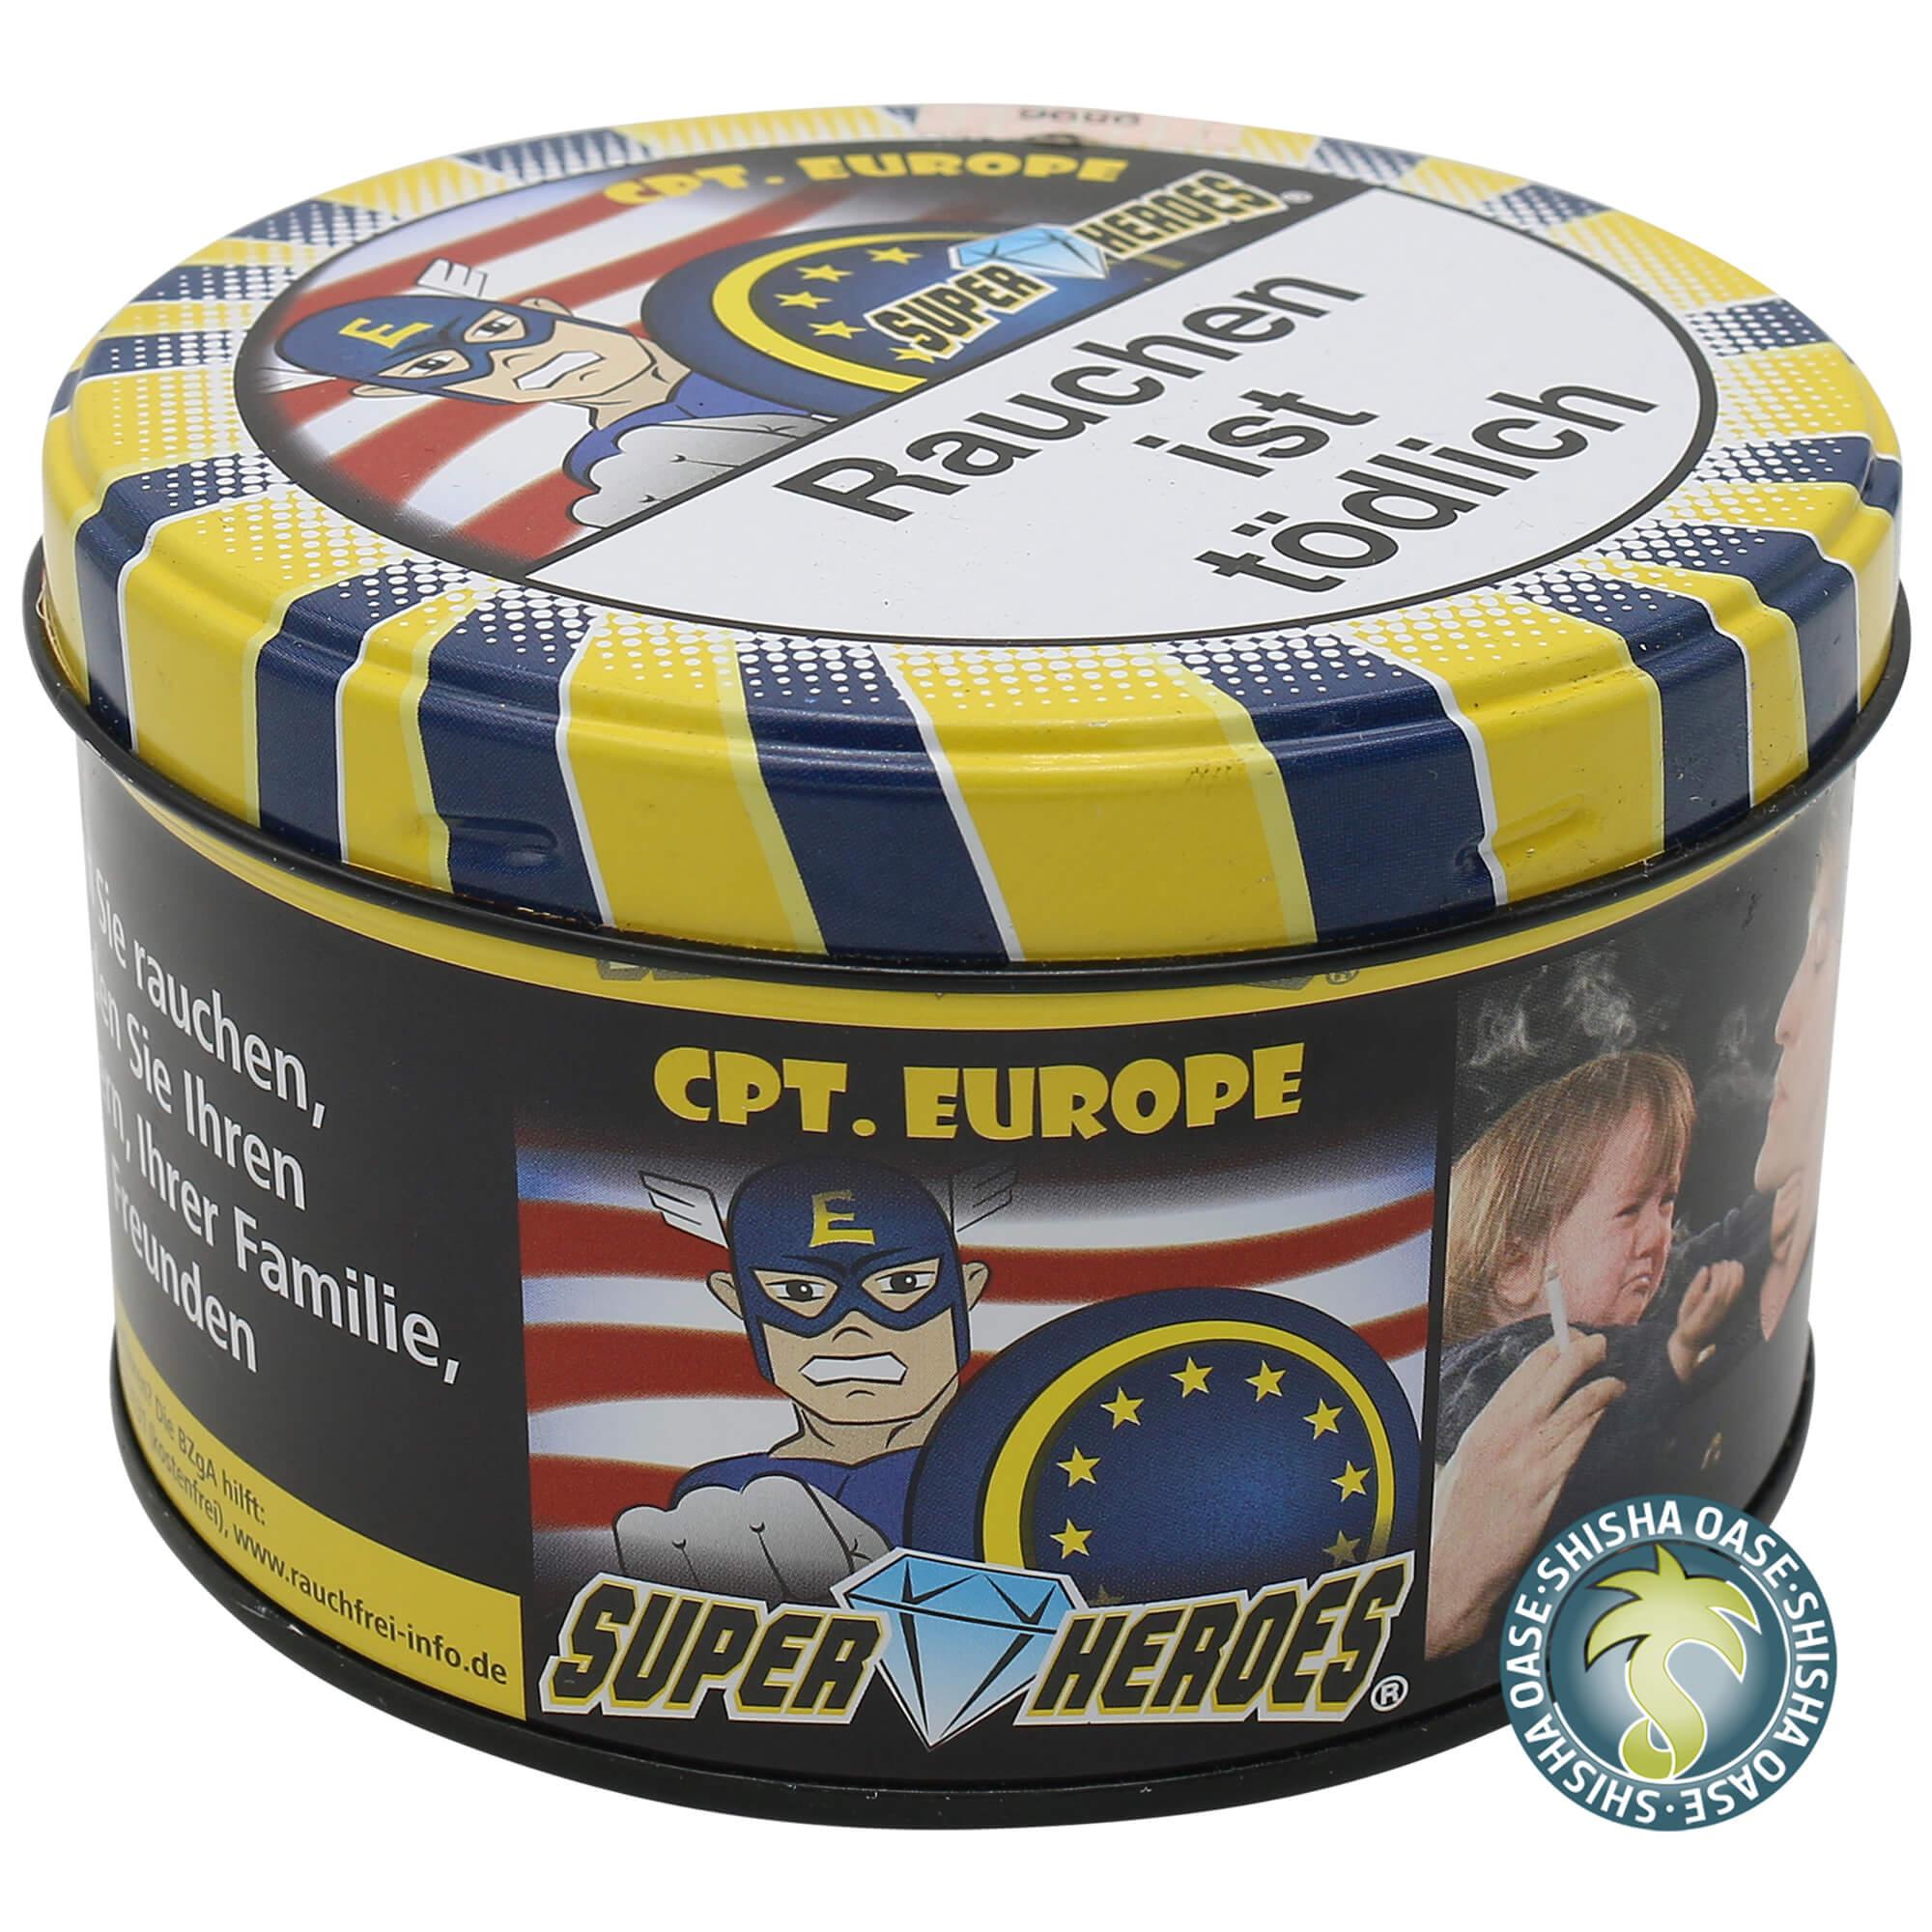 Super Heroes Tabak Cpt. Europe 200g